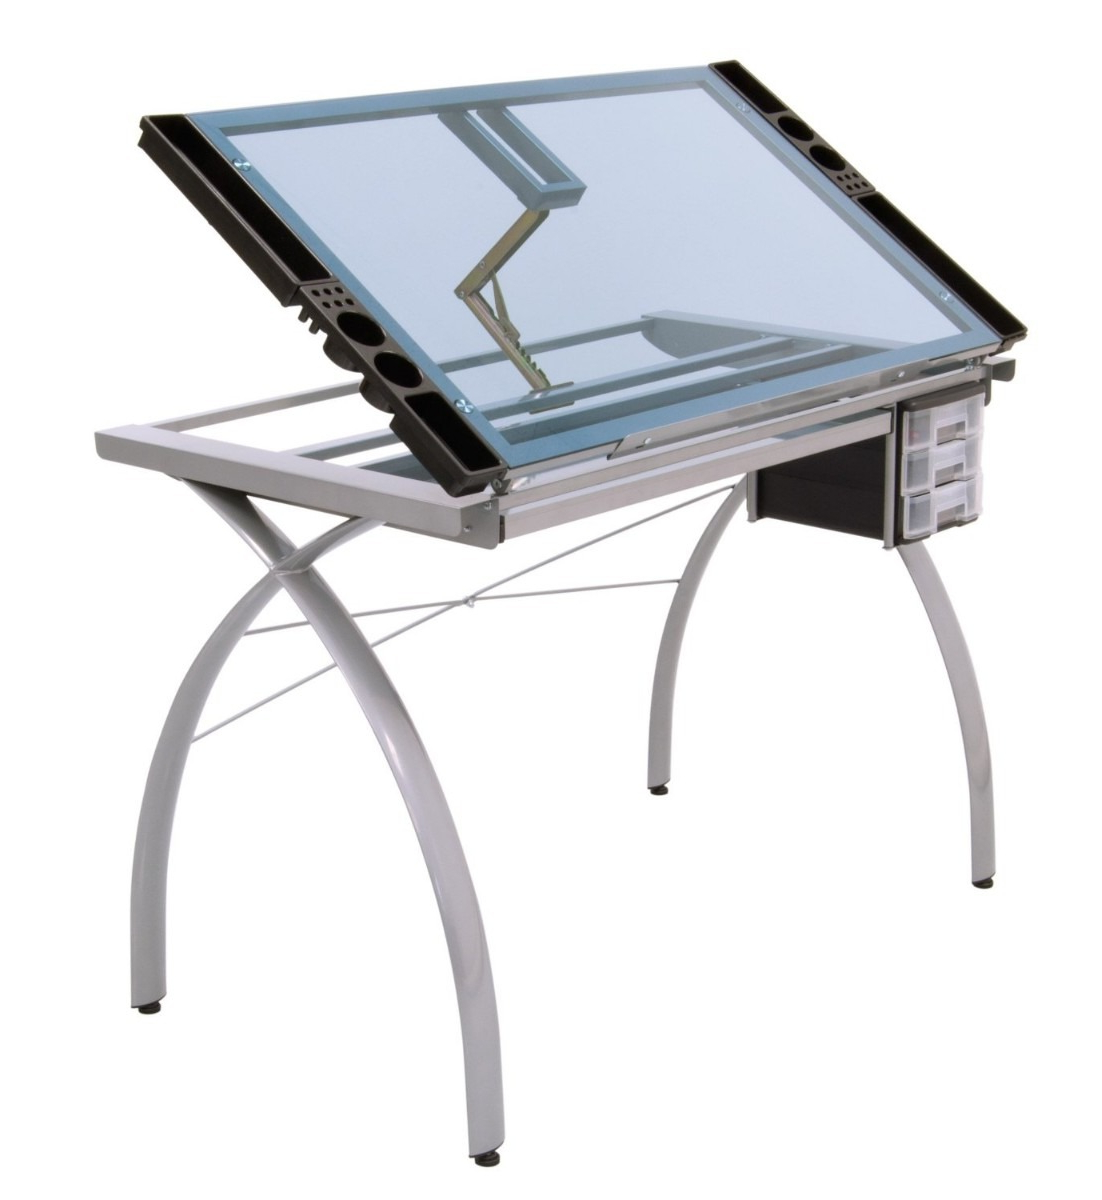 Mesa Para Dibujar Dwdk Mesa Para Dibujo Artà Stico De Cristal Escritorio Dibujar Vbf